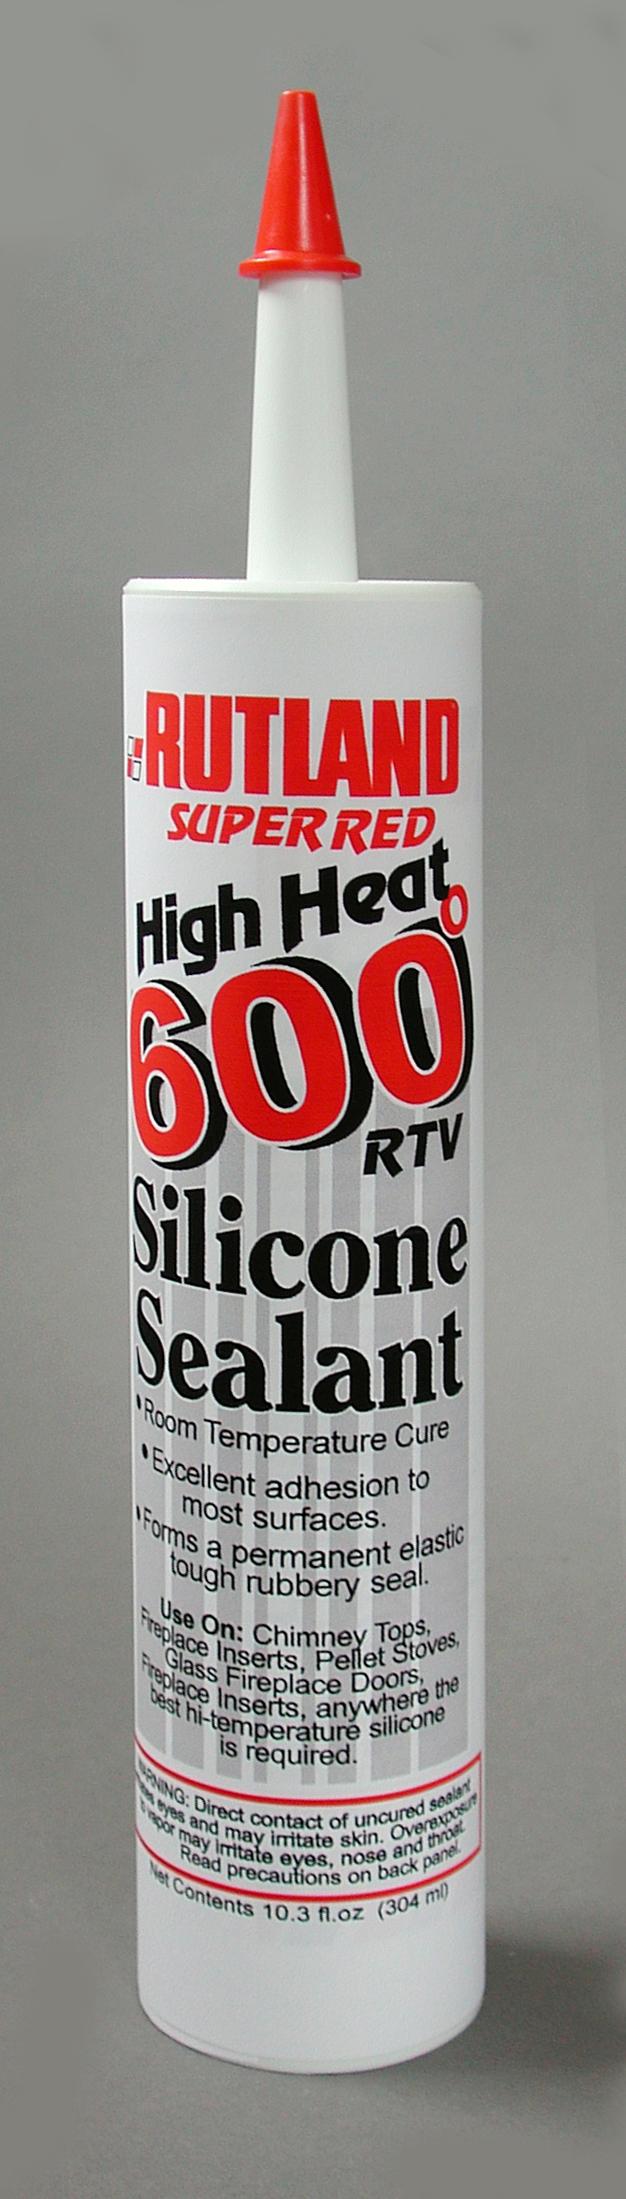 rutland high heat silicone and adhesive